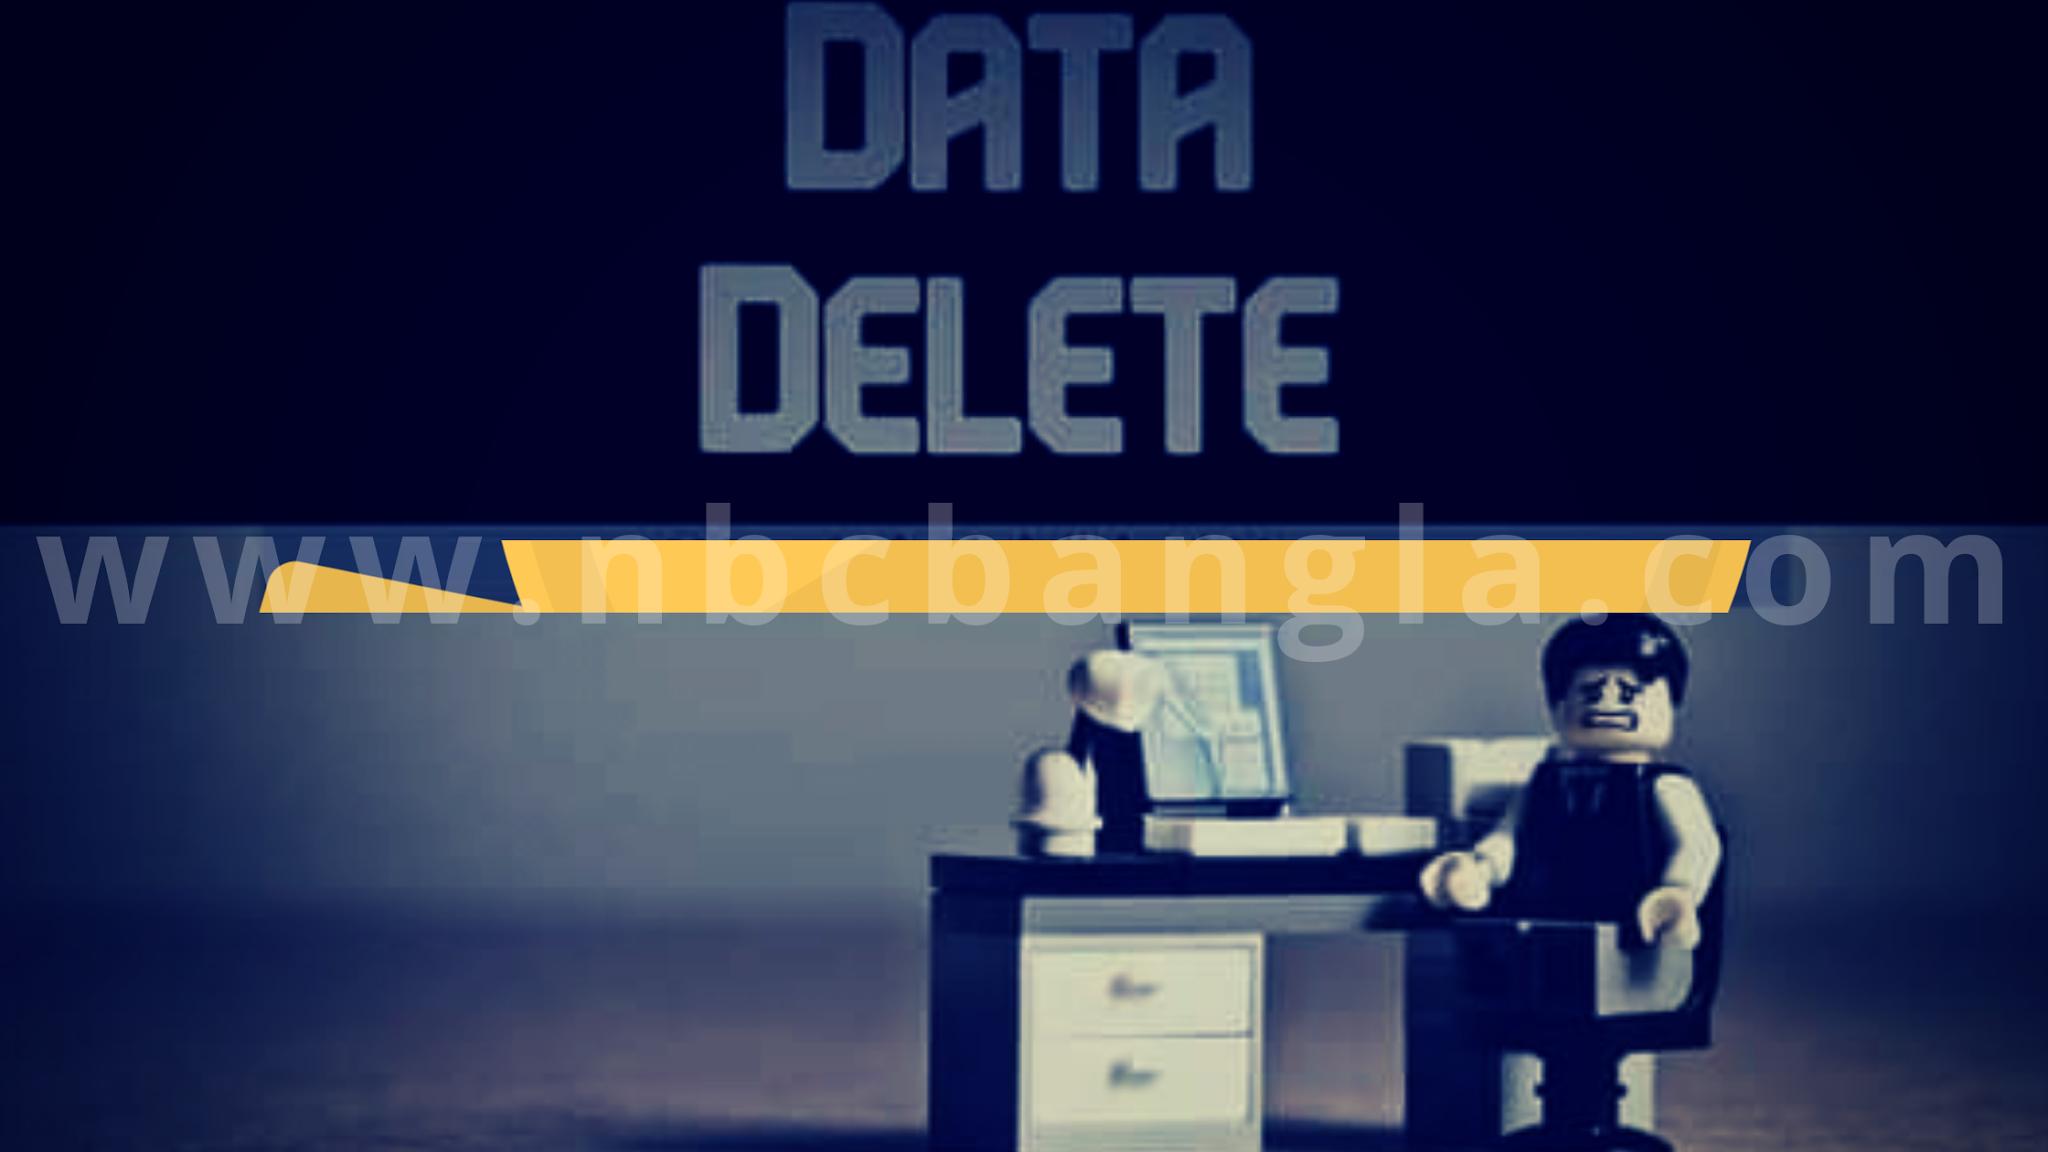 deleted data,Where deleted data goes,Delete হওয়া ডাটা কোথায় যায়,recover deleted files,data recovery,where does deleted data go,what happens to deleted data,where do deleted data go,how to recover deleted data,where do deleted files go,where does deleted data goes,delete,where the deleted data goes in a computer,deleted,deleted files,deleted data hindi,how to recover deleted files,where does deleted files go,where does the deleted data go,where delete data gone,where are the deleted files,where do deleted files go on android